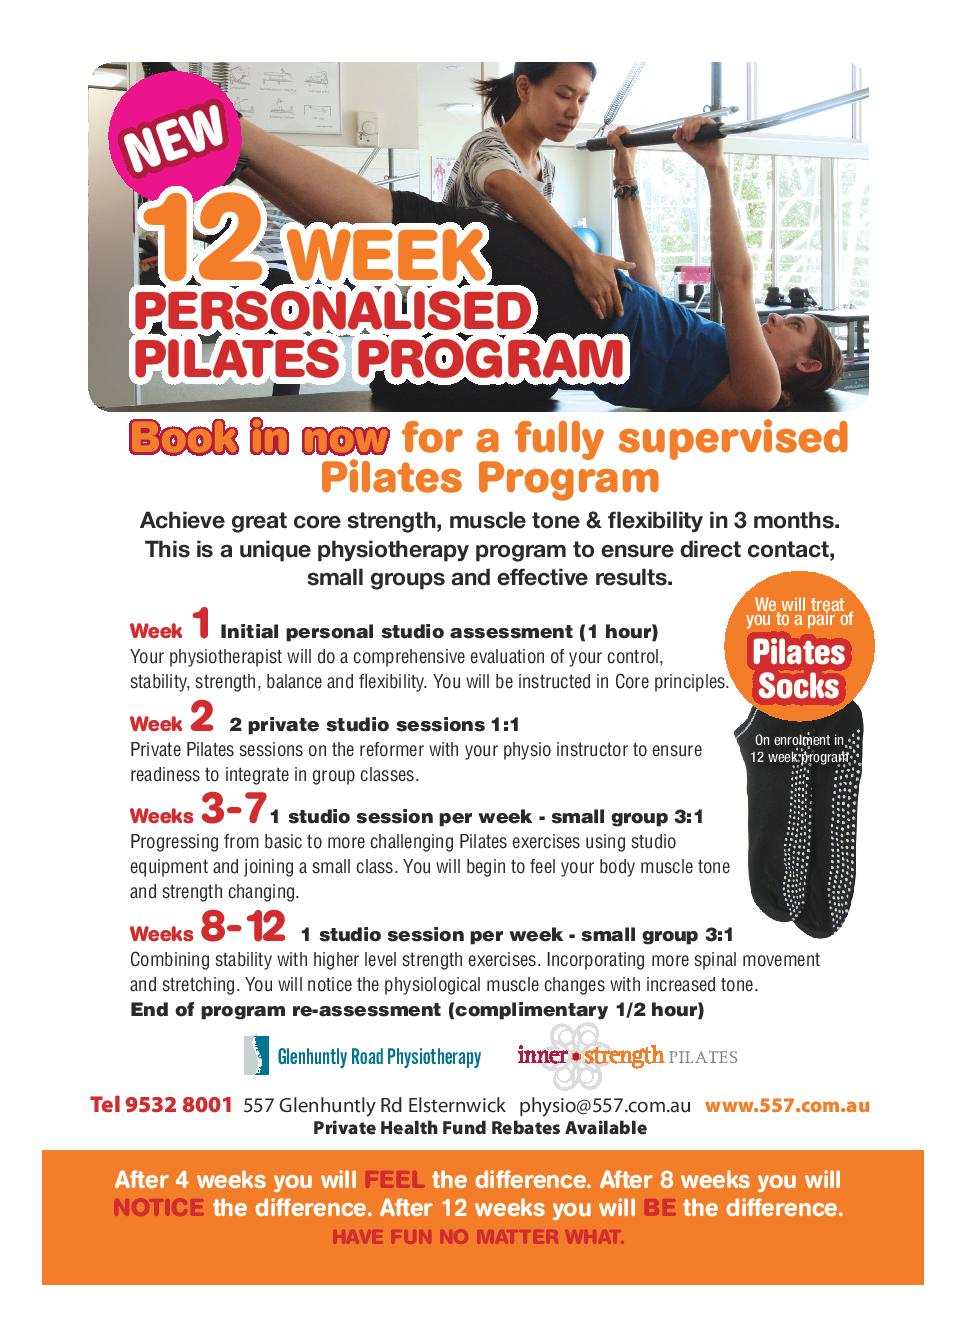 pilates-classes-st-kilda-pilates-class-elsternwick-pilates-classes-Albert-Park-How to build your core strength